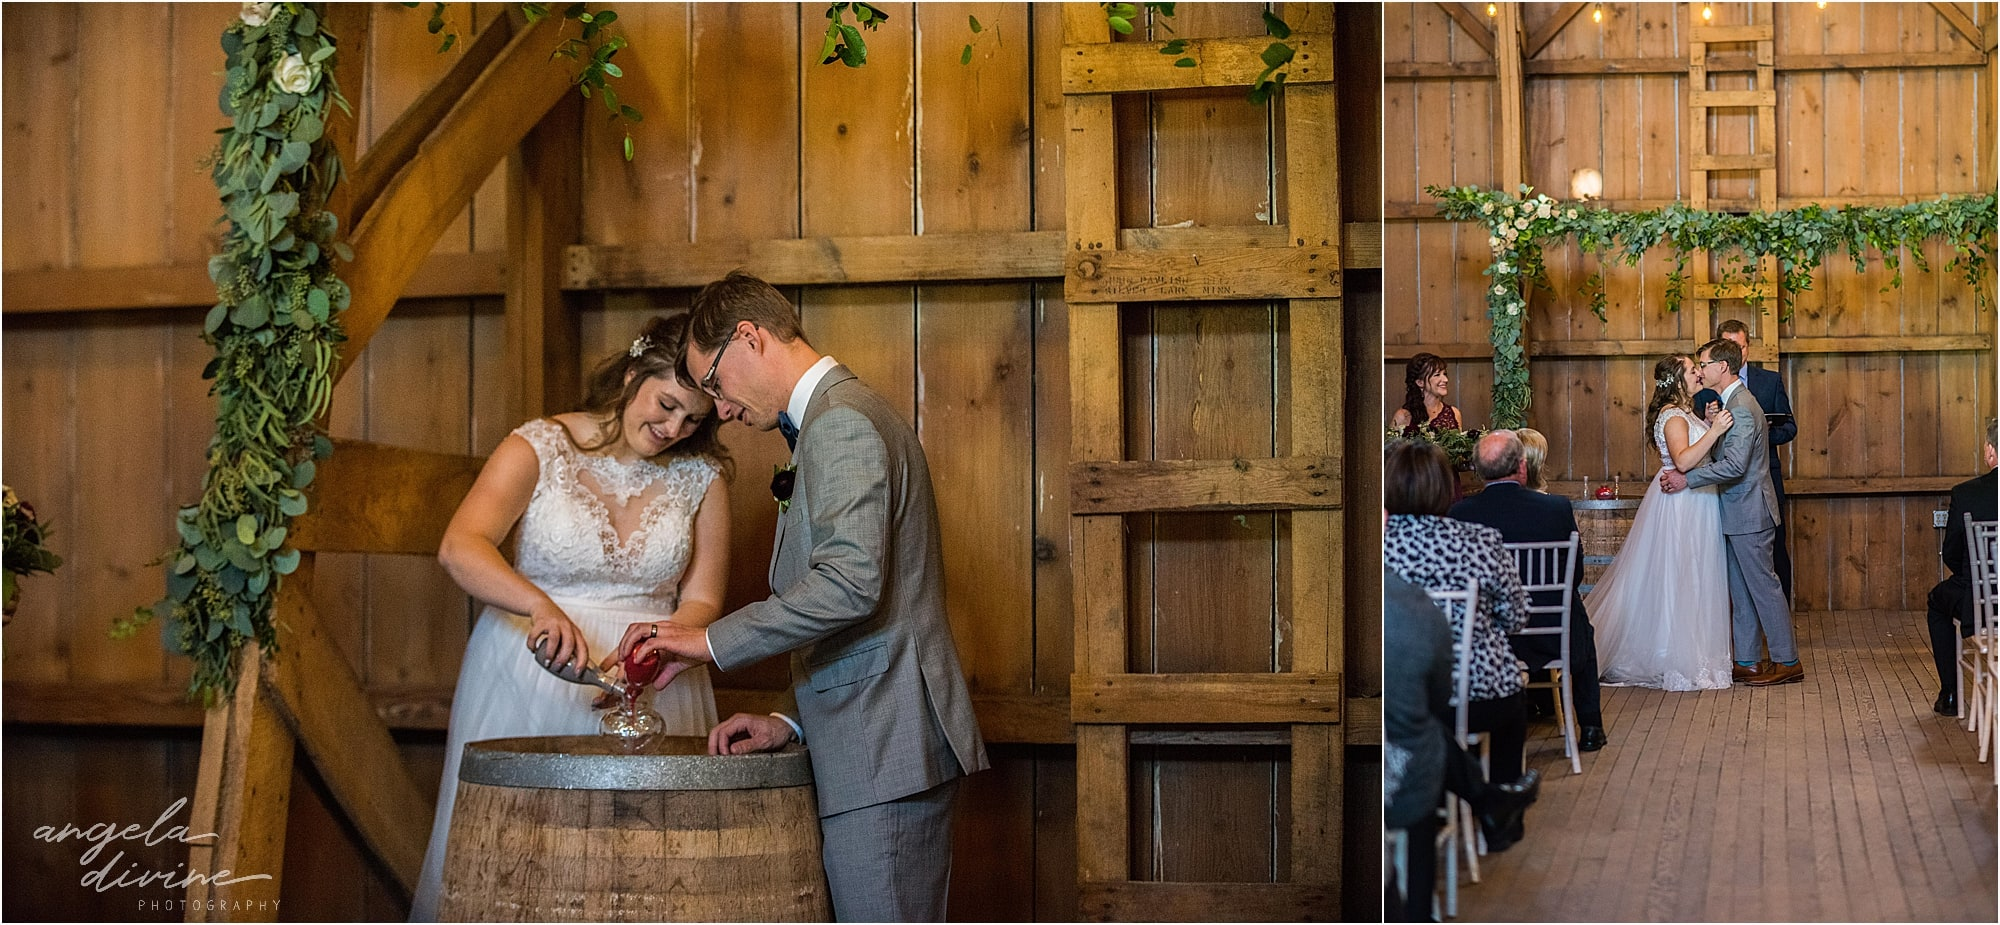 The Cottage Farmhouse Wedding Ceremony vows